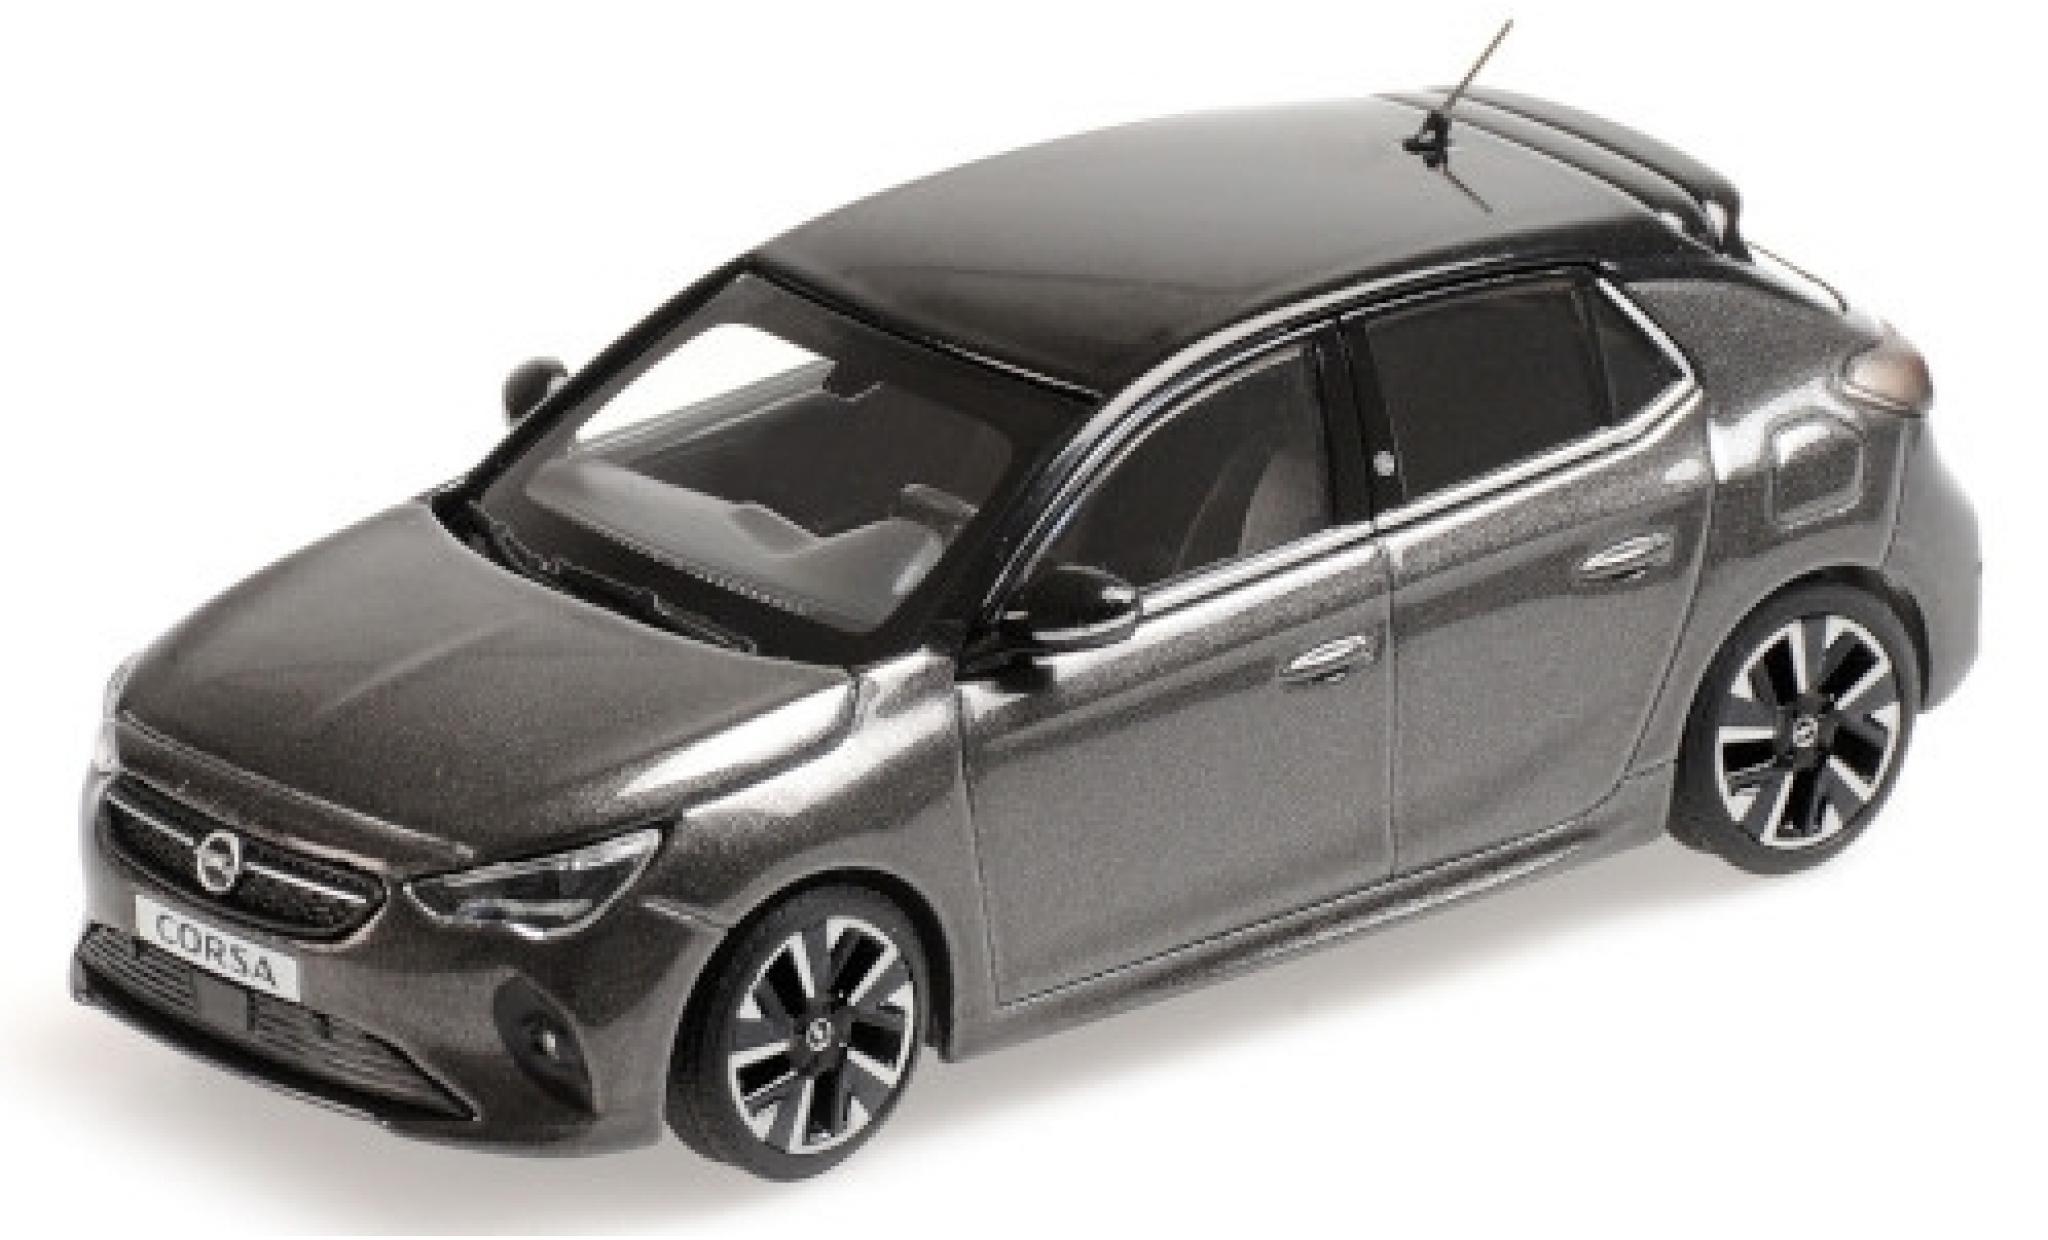 Opel Corsa 1/43 Minichamps E metallise grise/noire 2019